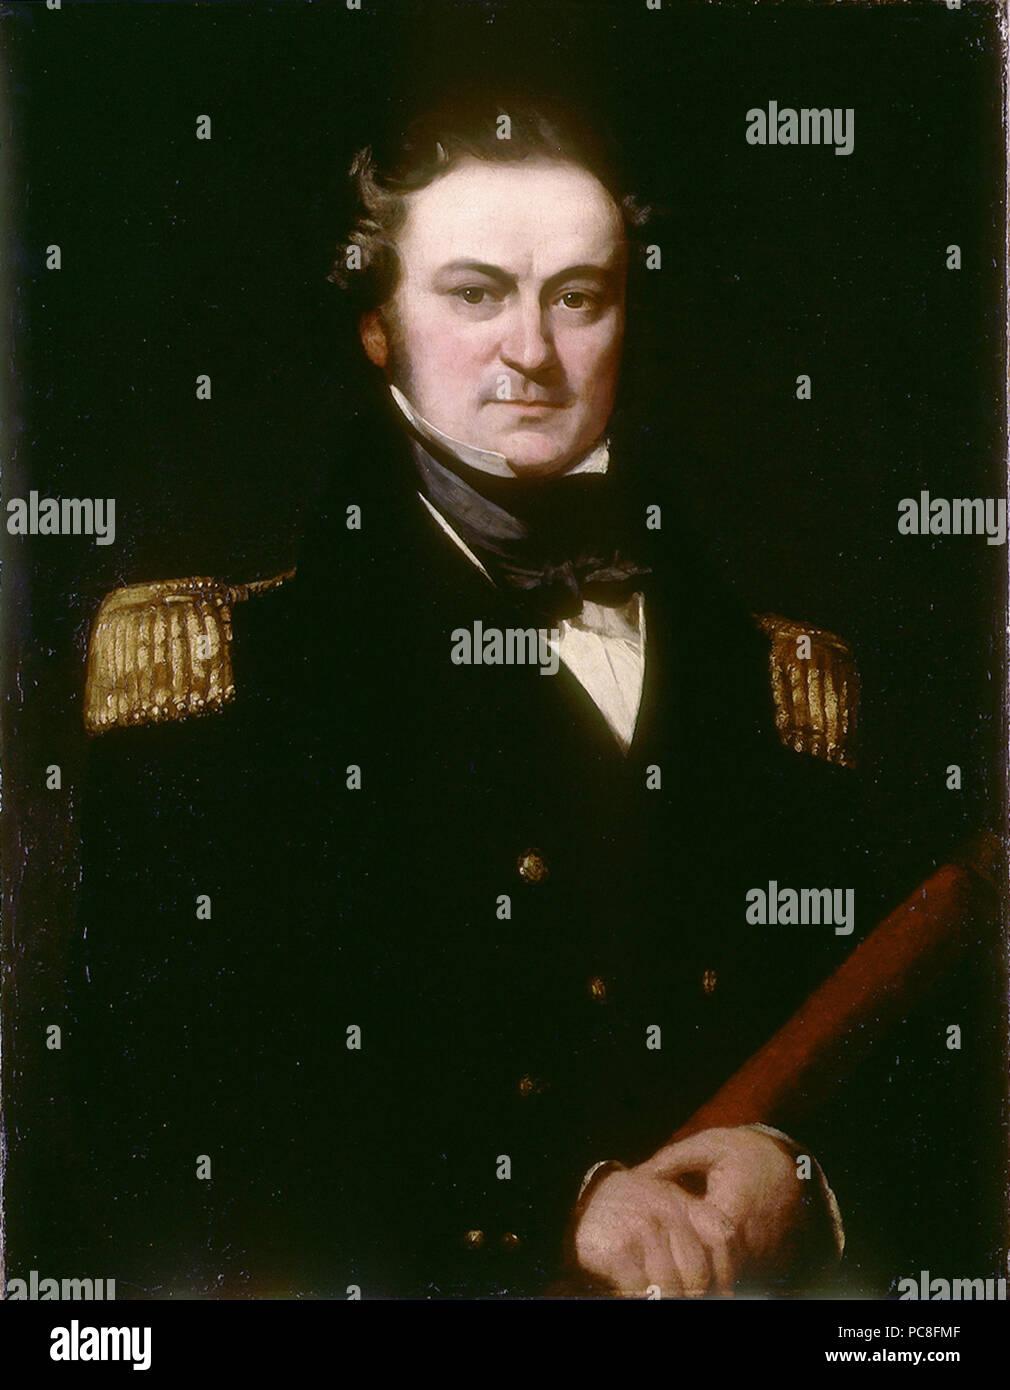 Il capitano William Edward Parry (1790-1855) *olio su tela *91,4 x 71,1 cm *ca 1830 111 Capitano William Edward Parry (1790-1855), da Charles Skottowe Immagini Stock